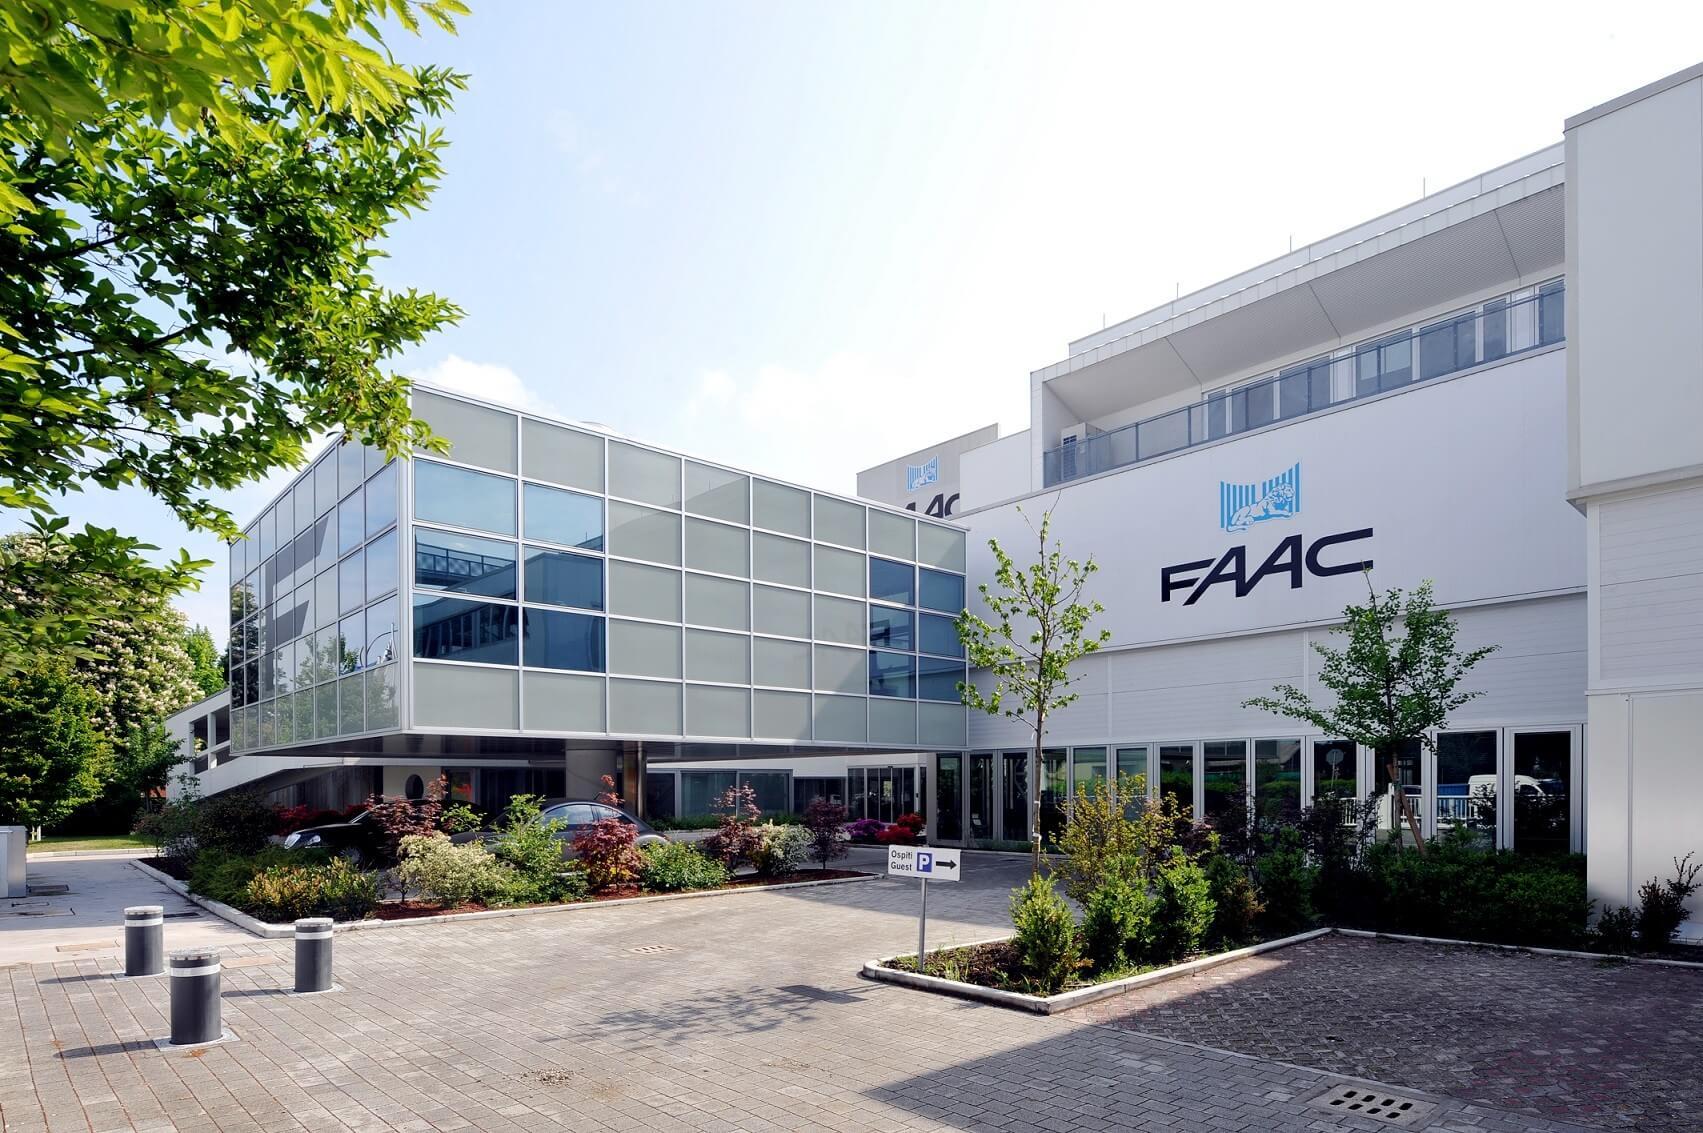 FAAC corporate office